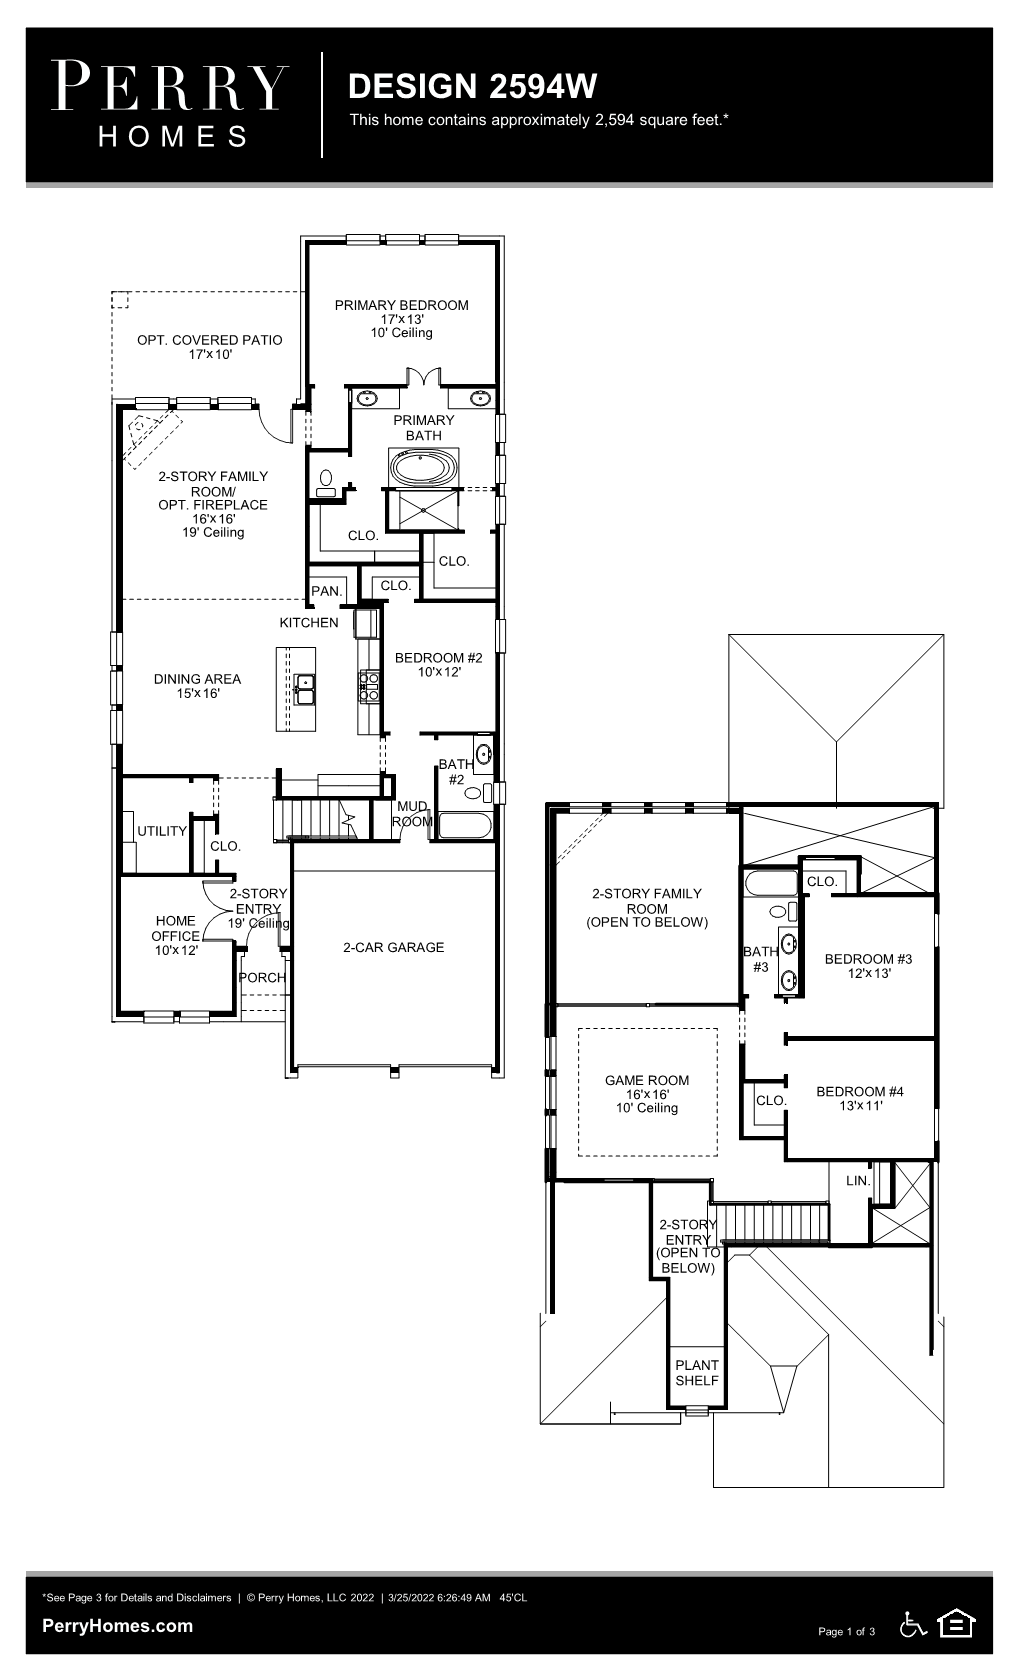 Floor Plan for 2594W